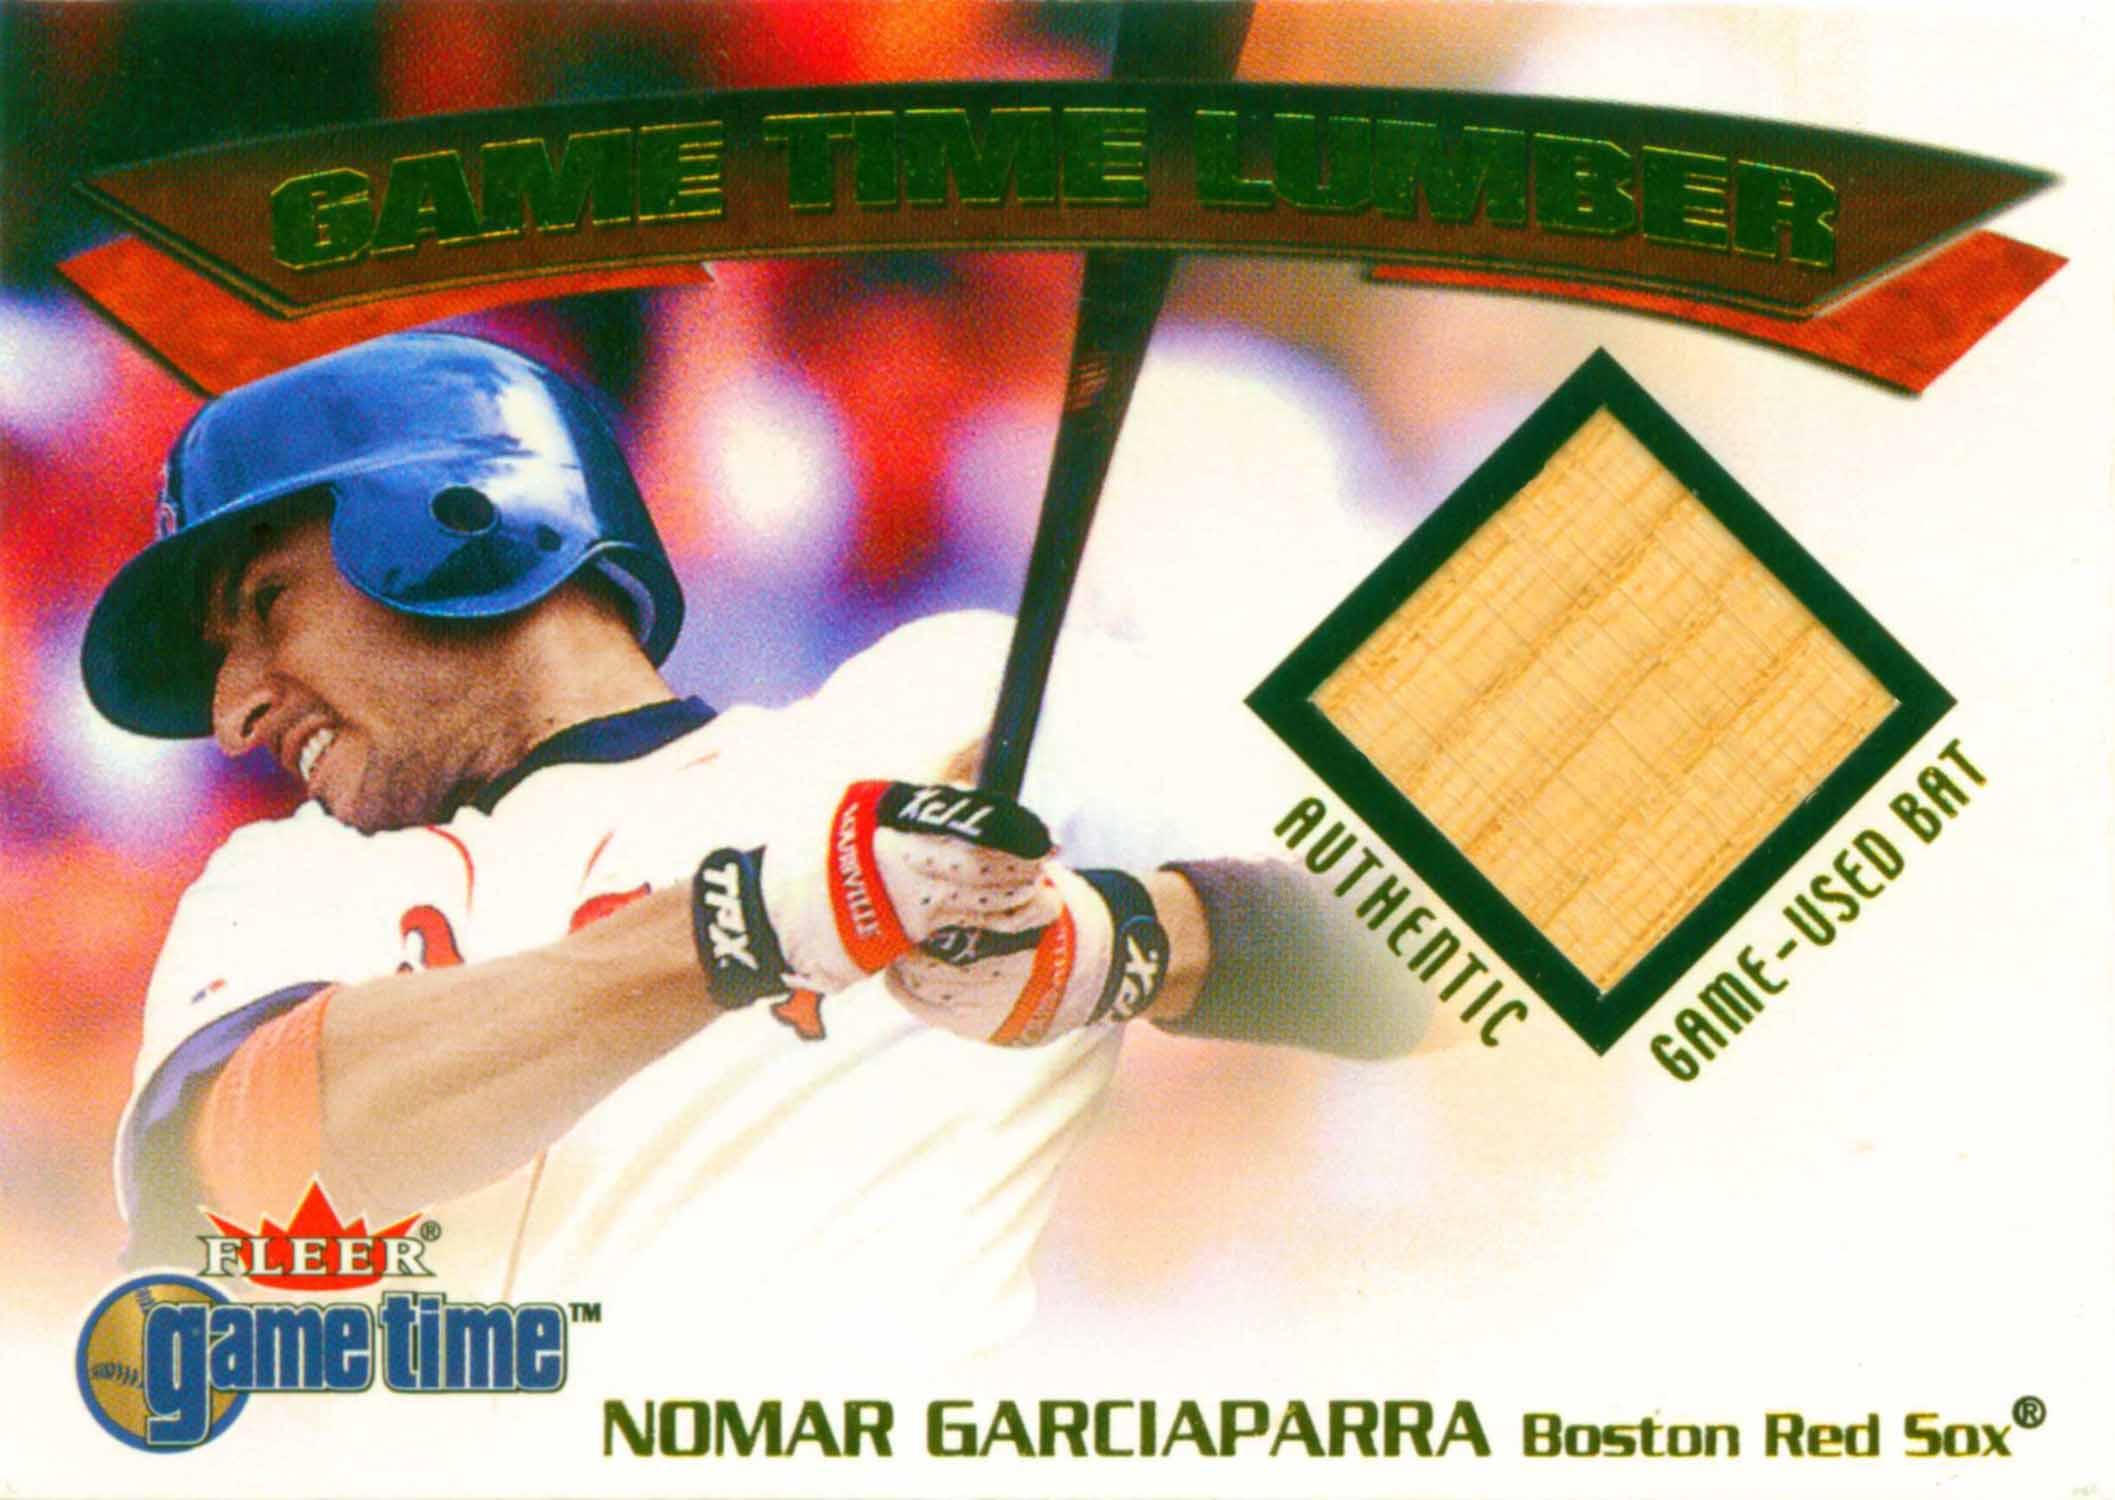 Nomar Garciaparra